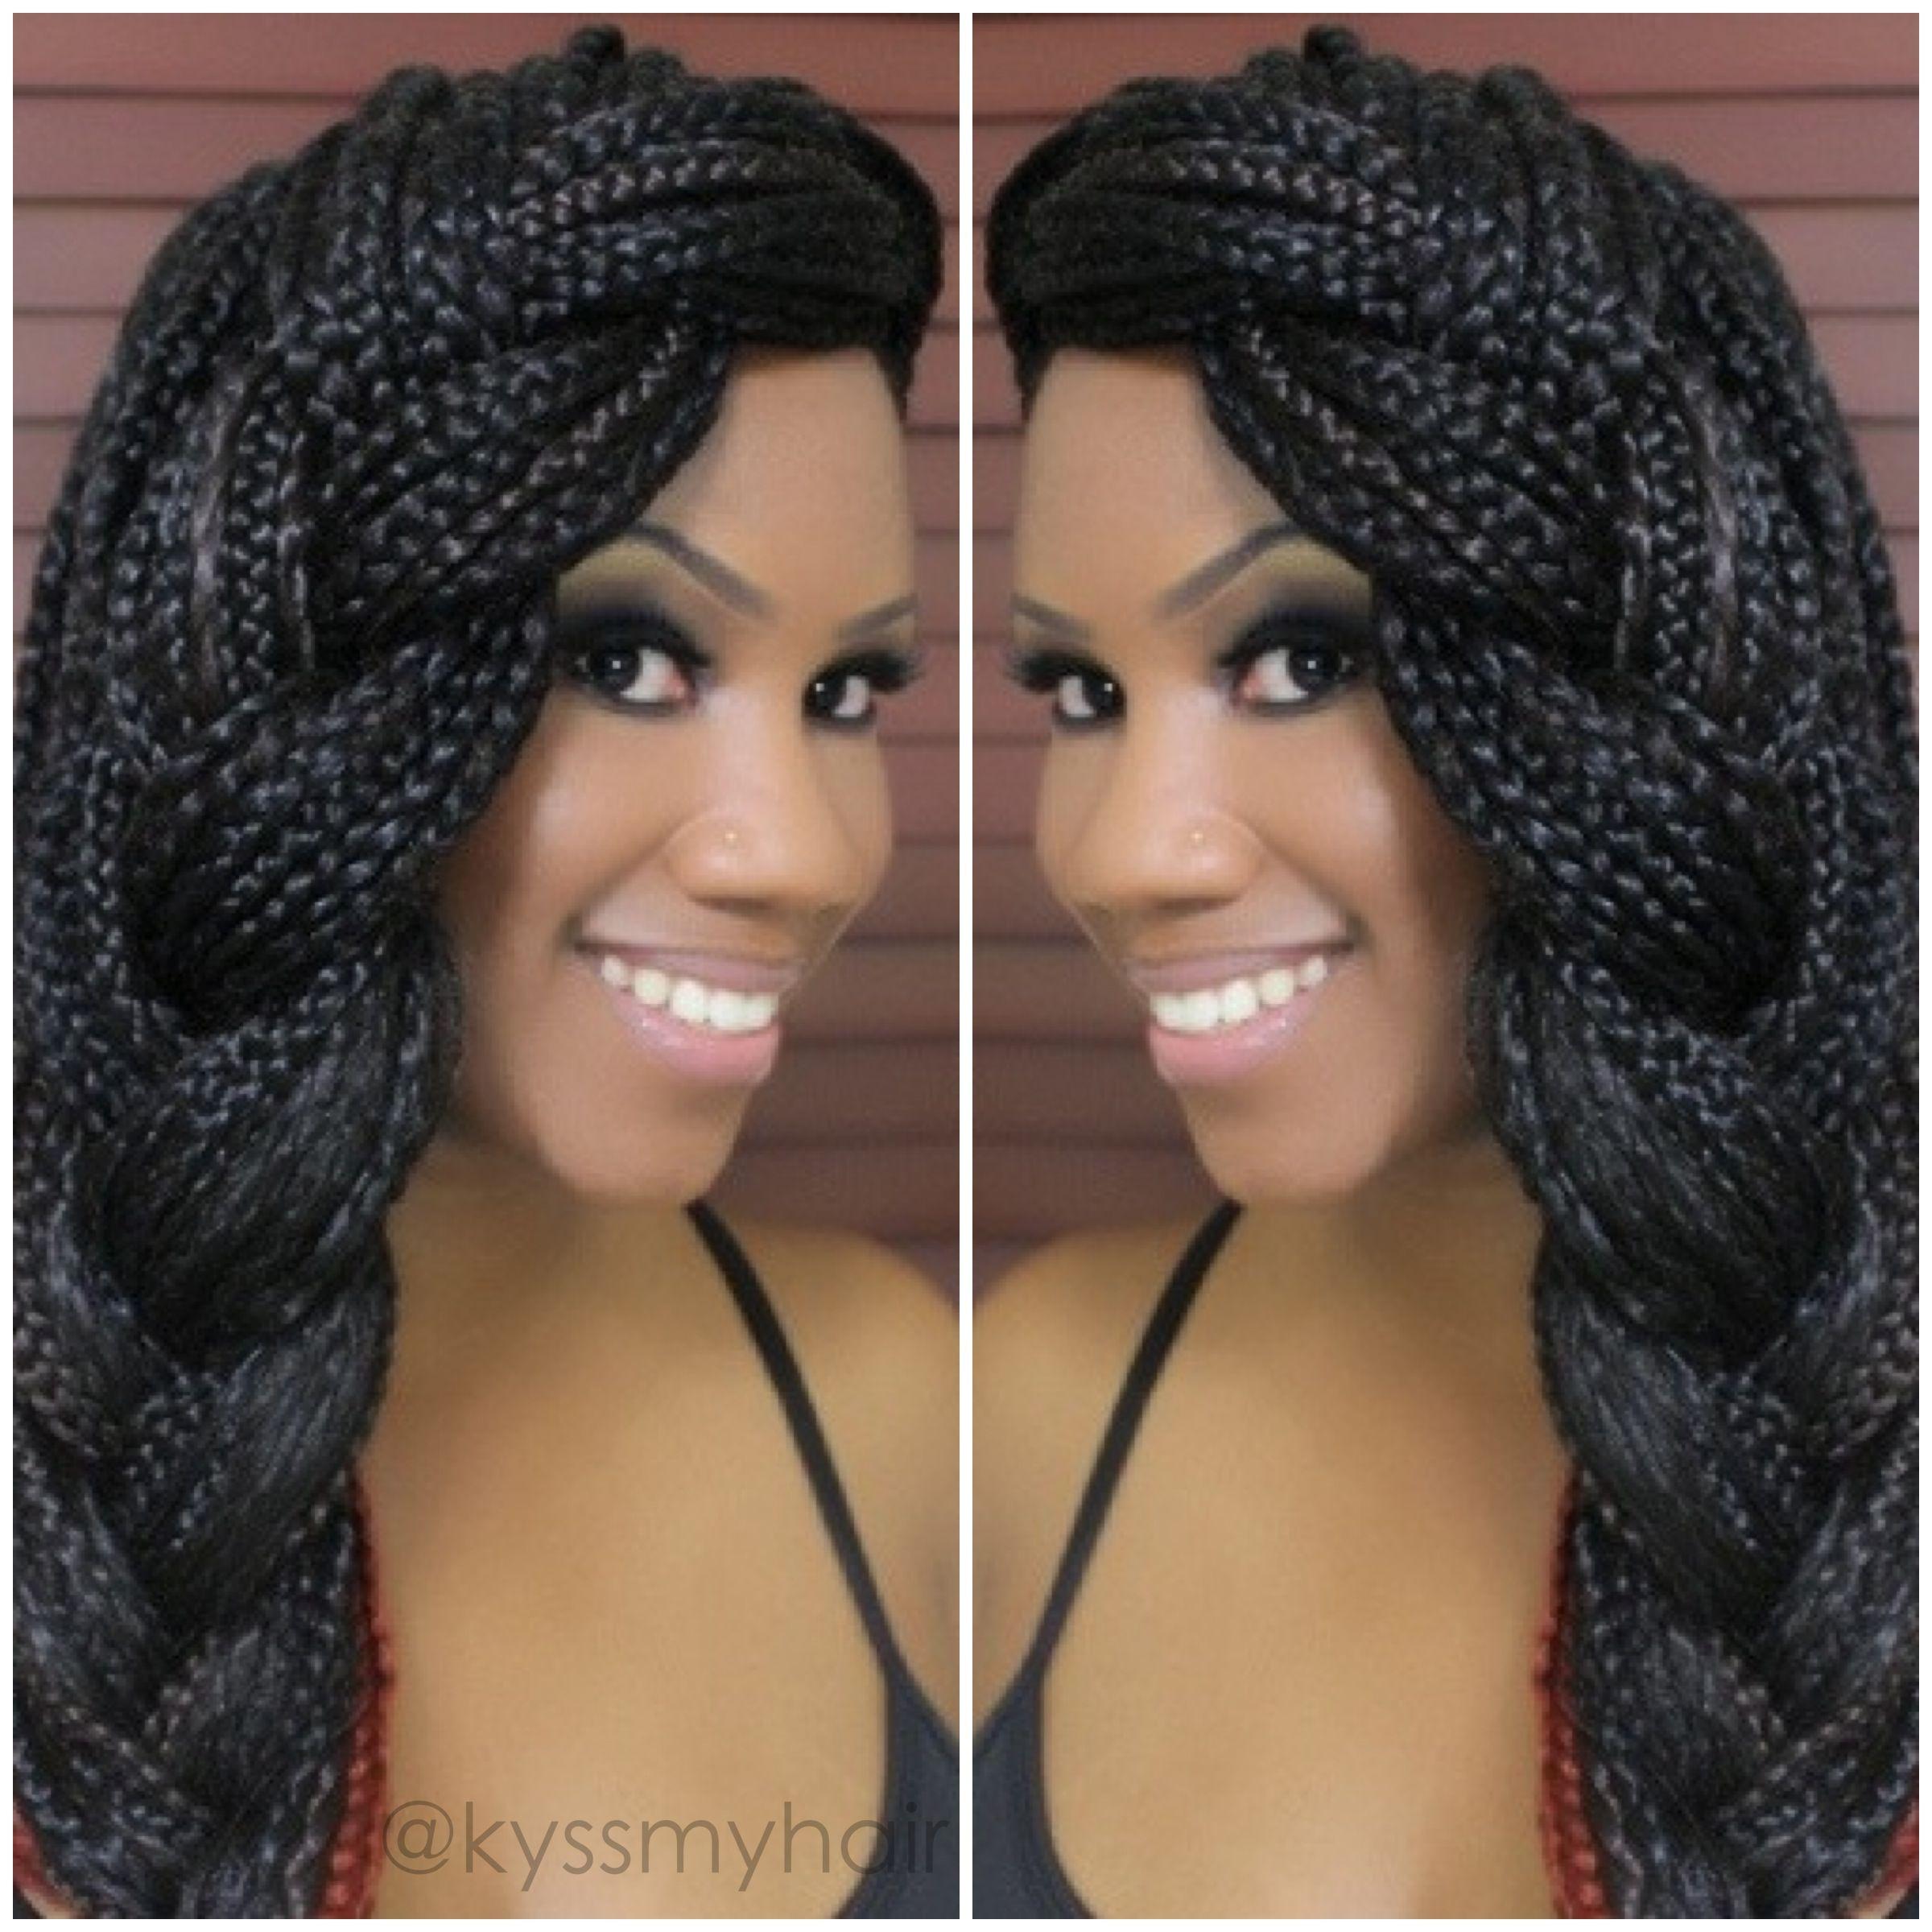 "Foto: Reprodução / <a href=""http://www.kyssmyhair.com/wp-content/uploads/2013/08/styles-for-box-braids3.jpg"" target=""_blank"">Kiss My Hair</a>"